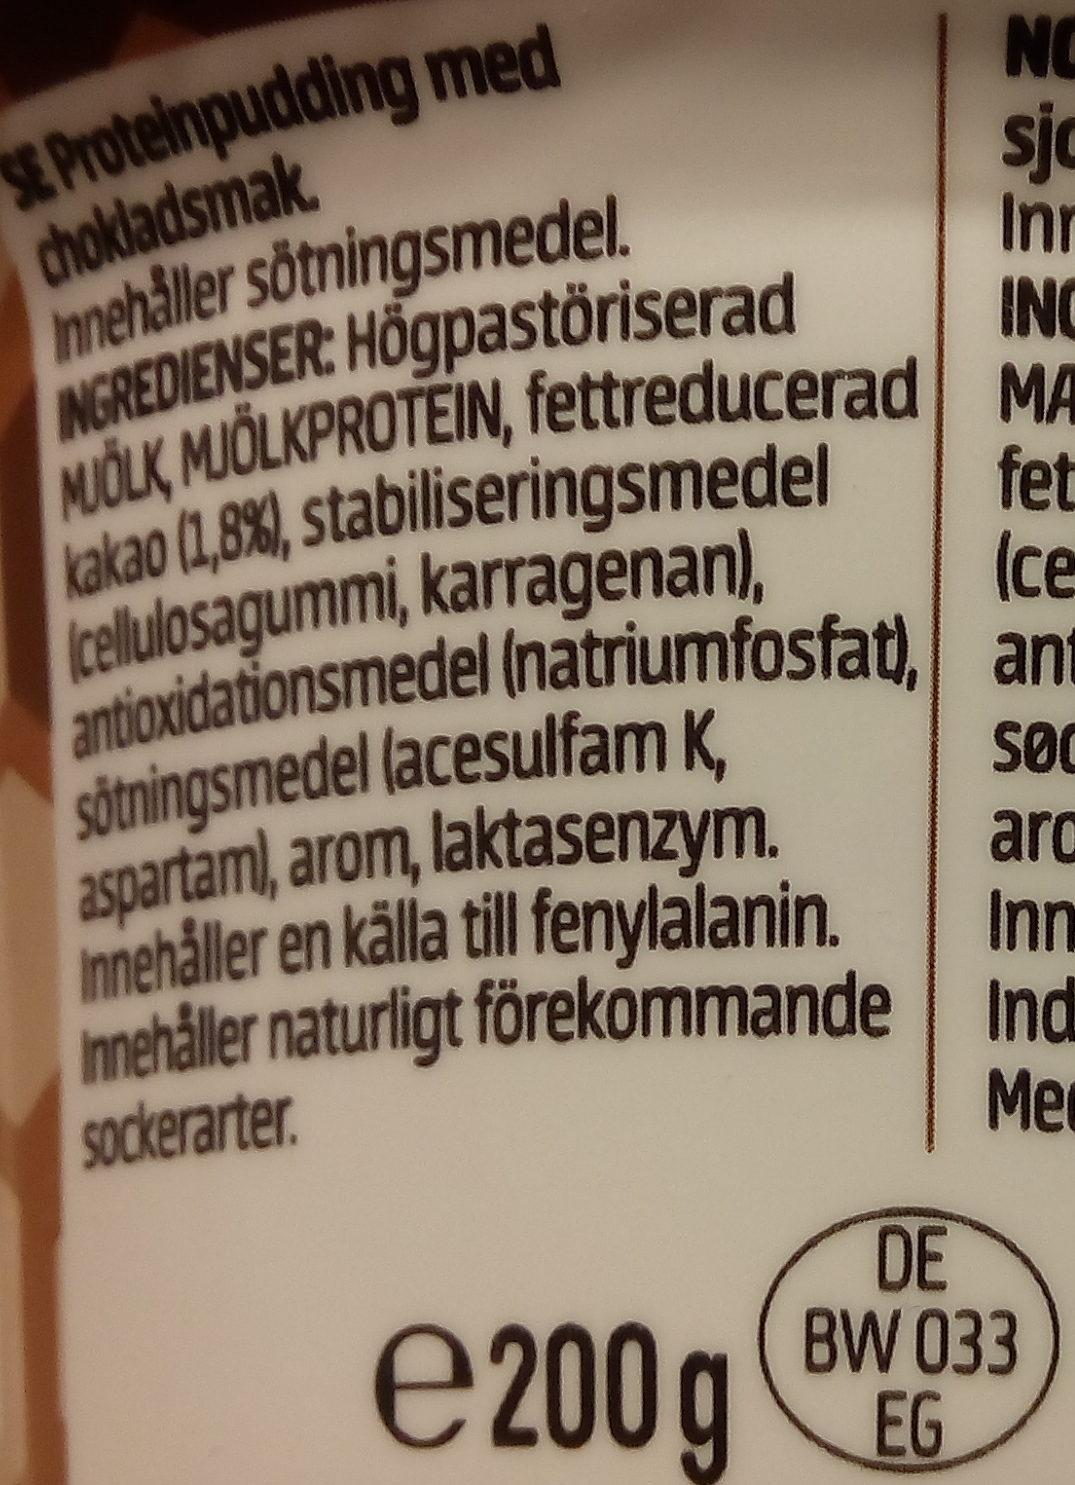 Propud protein pudding - Ingrédients - sv